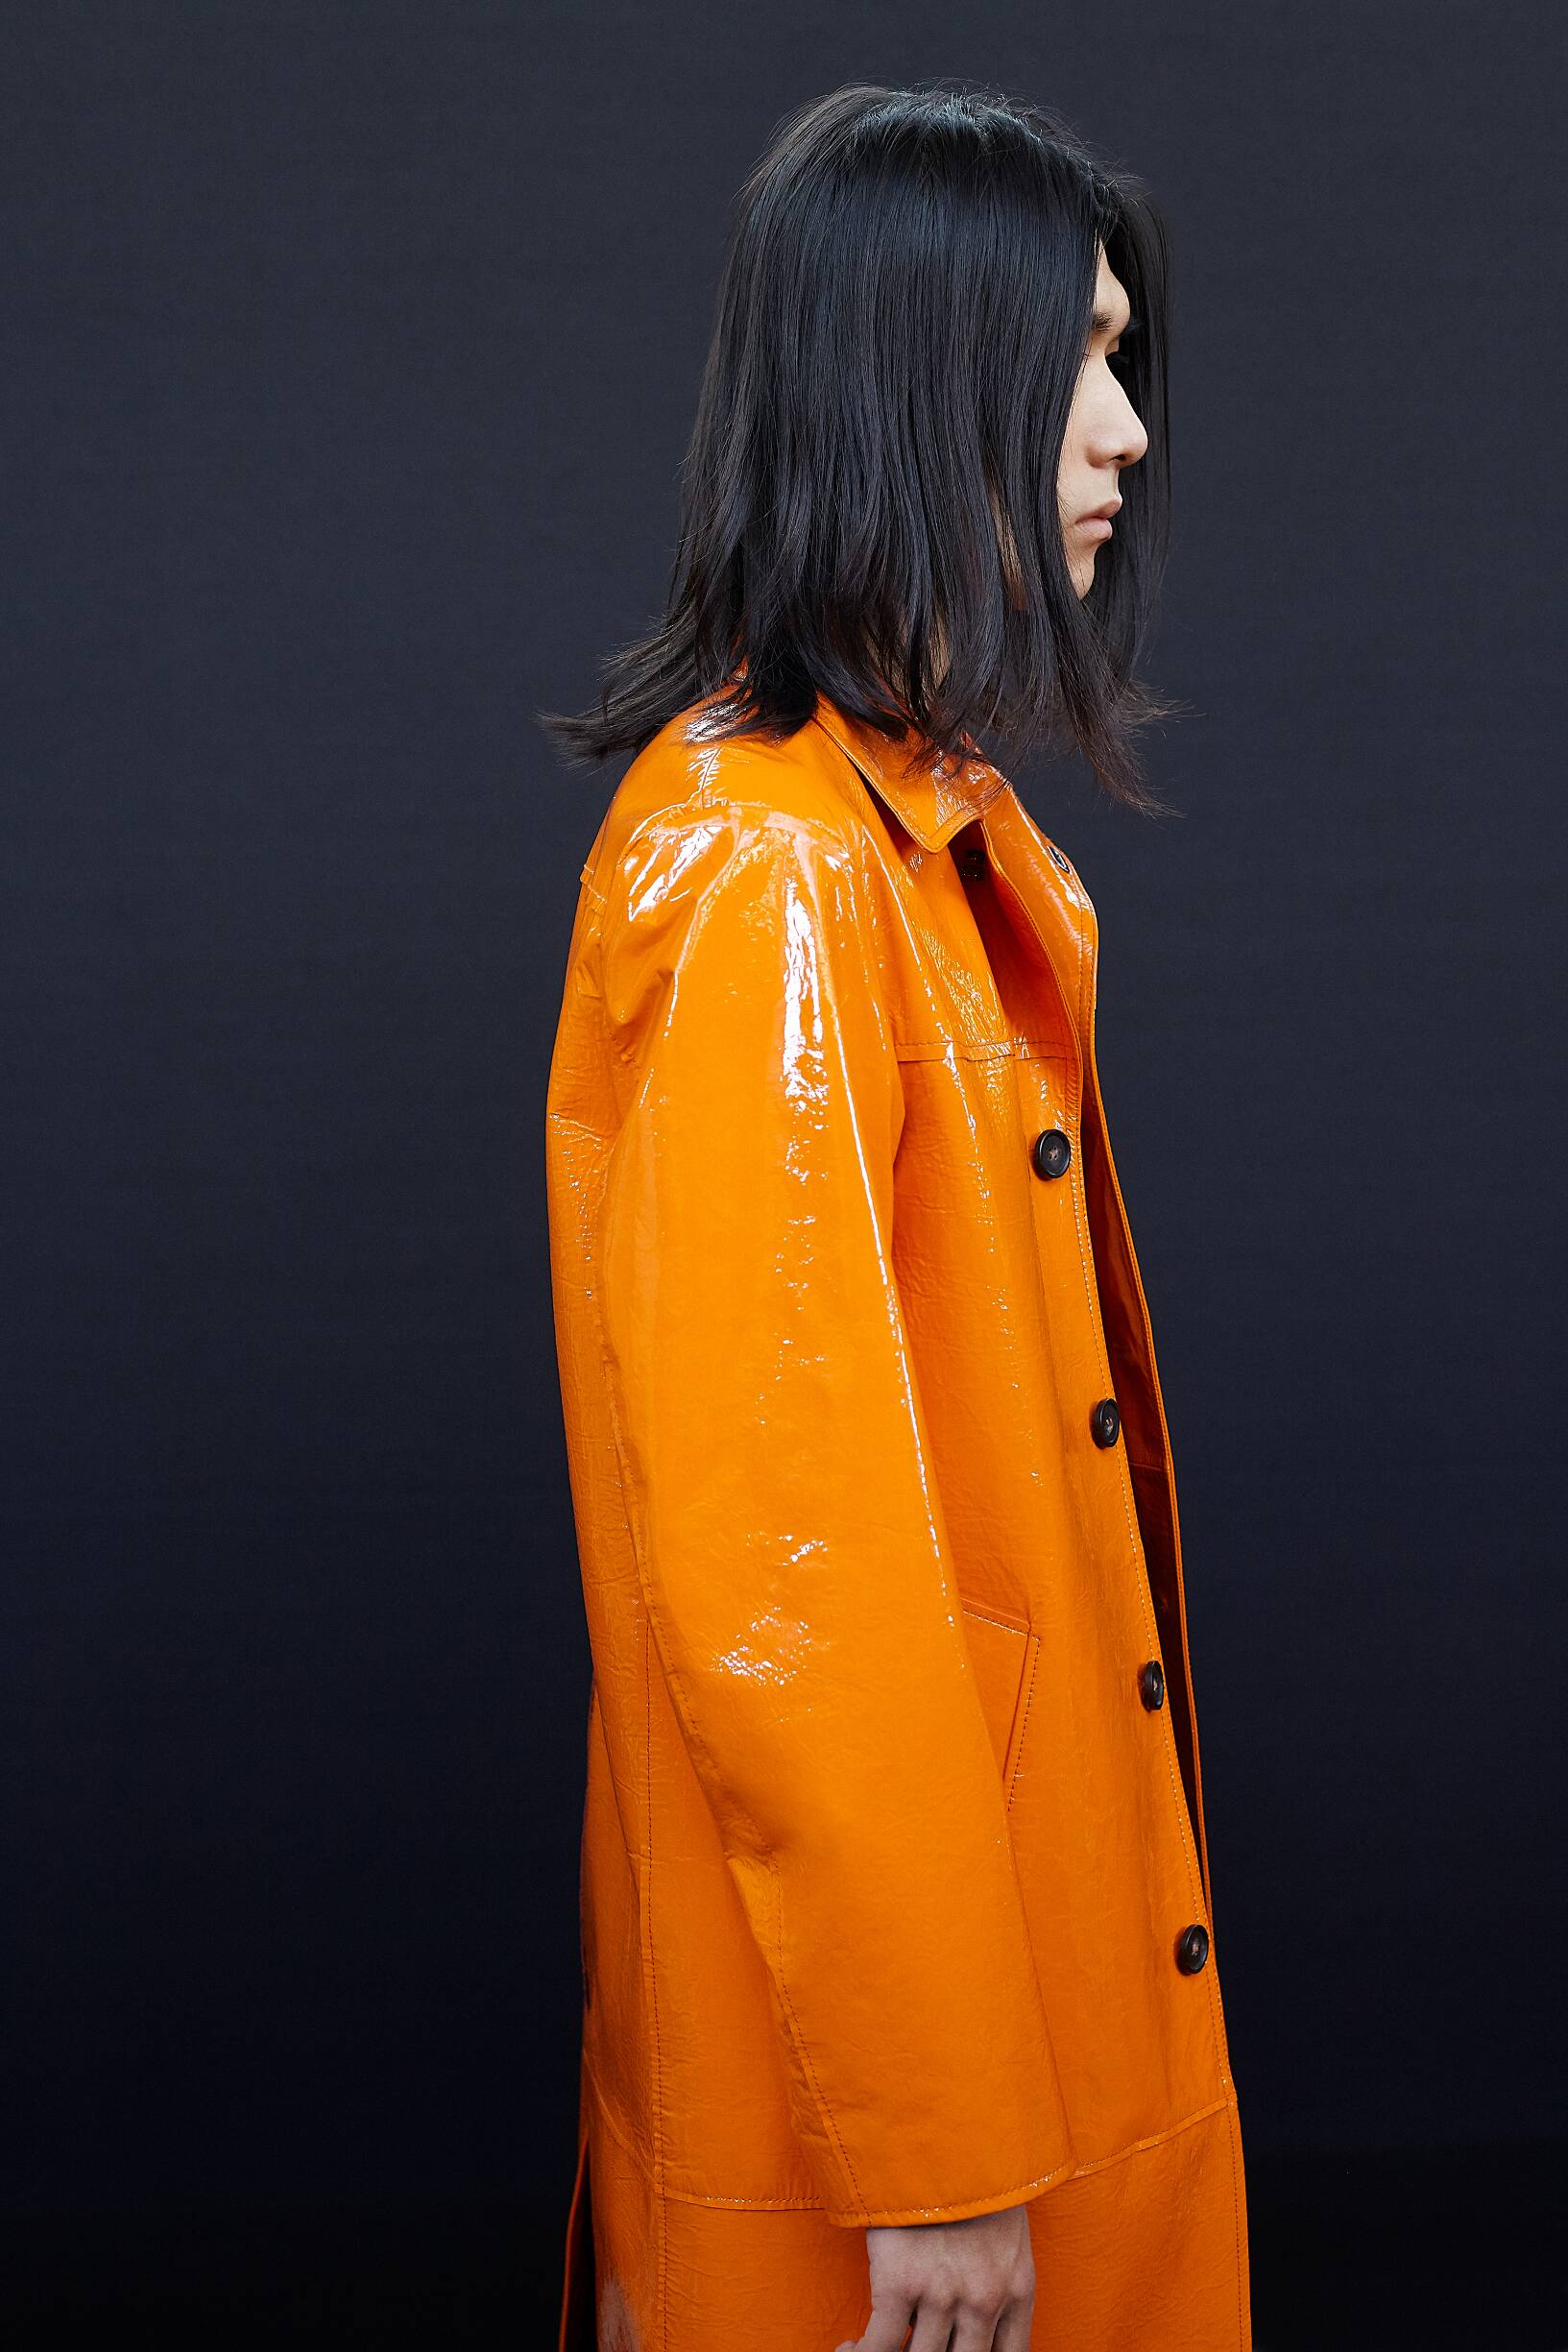 Backstage Acne Studios Fall Menswear 2019